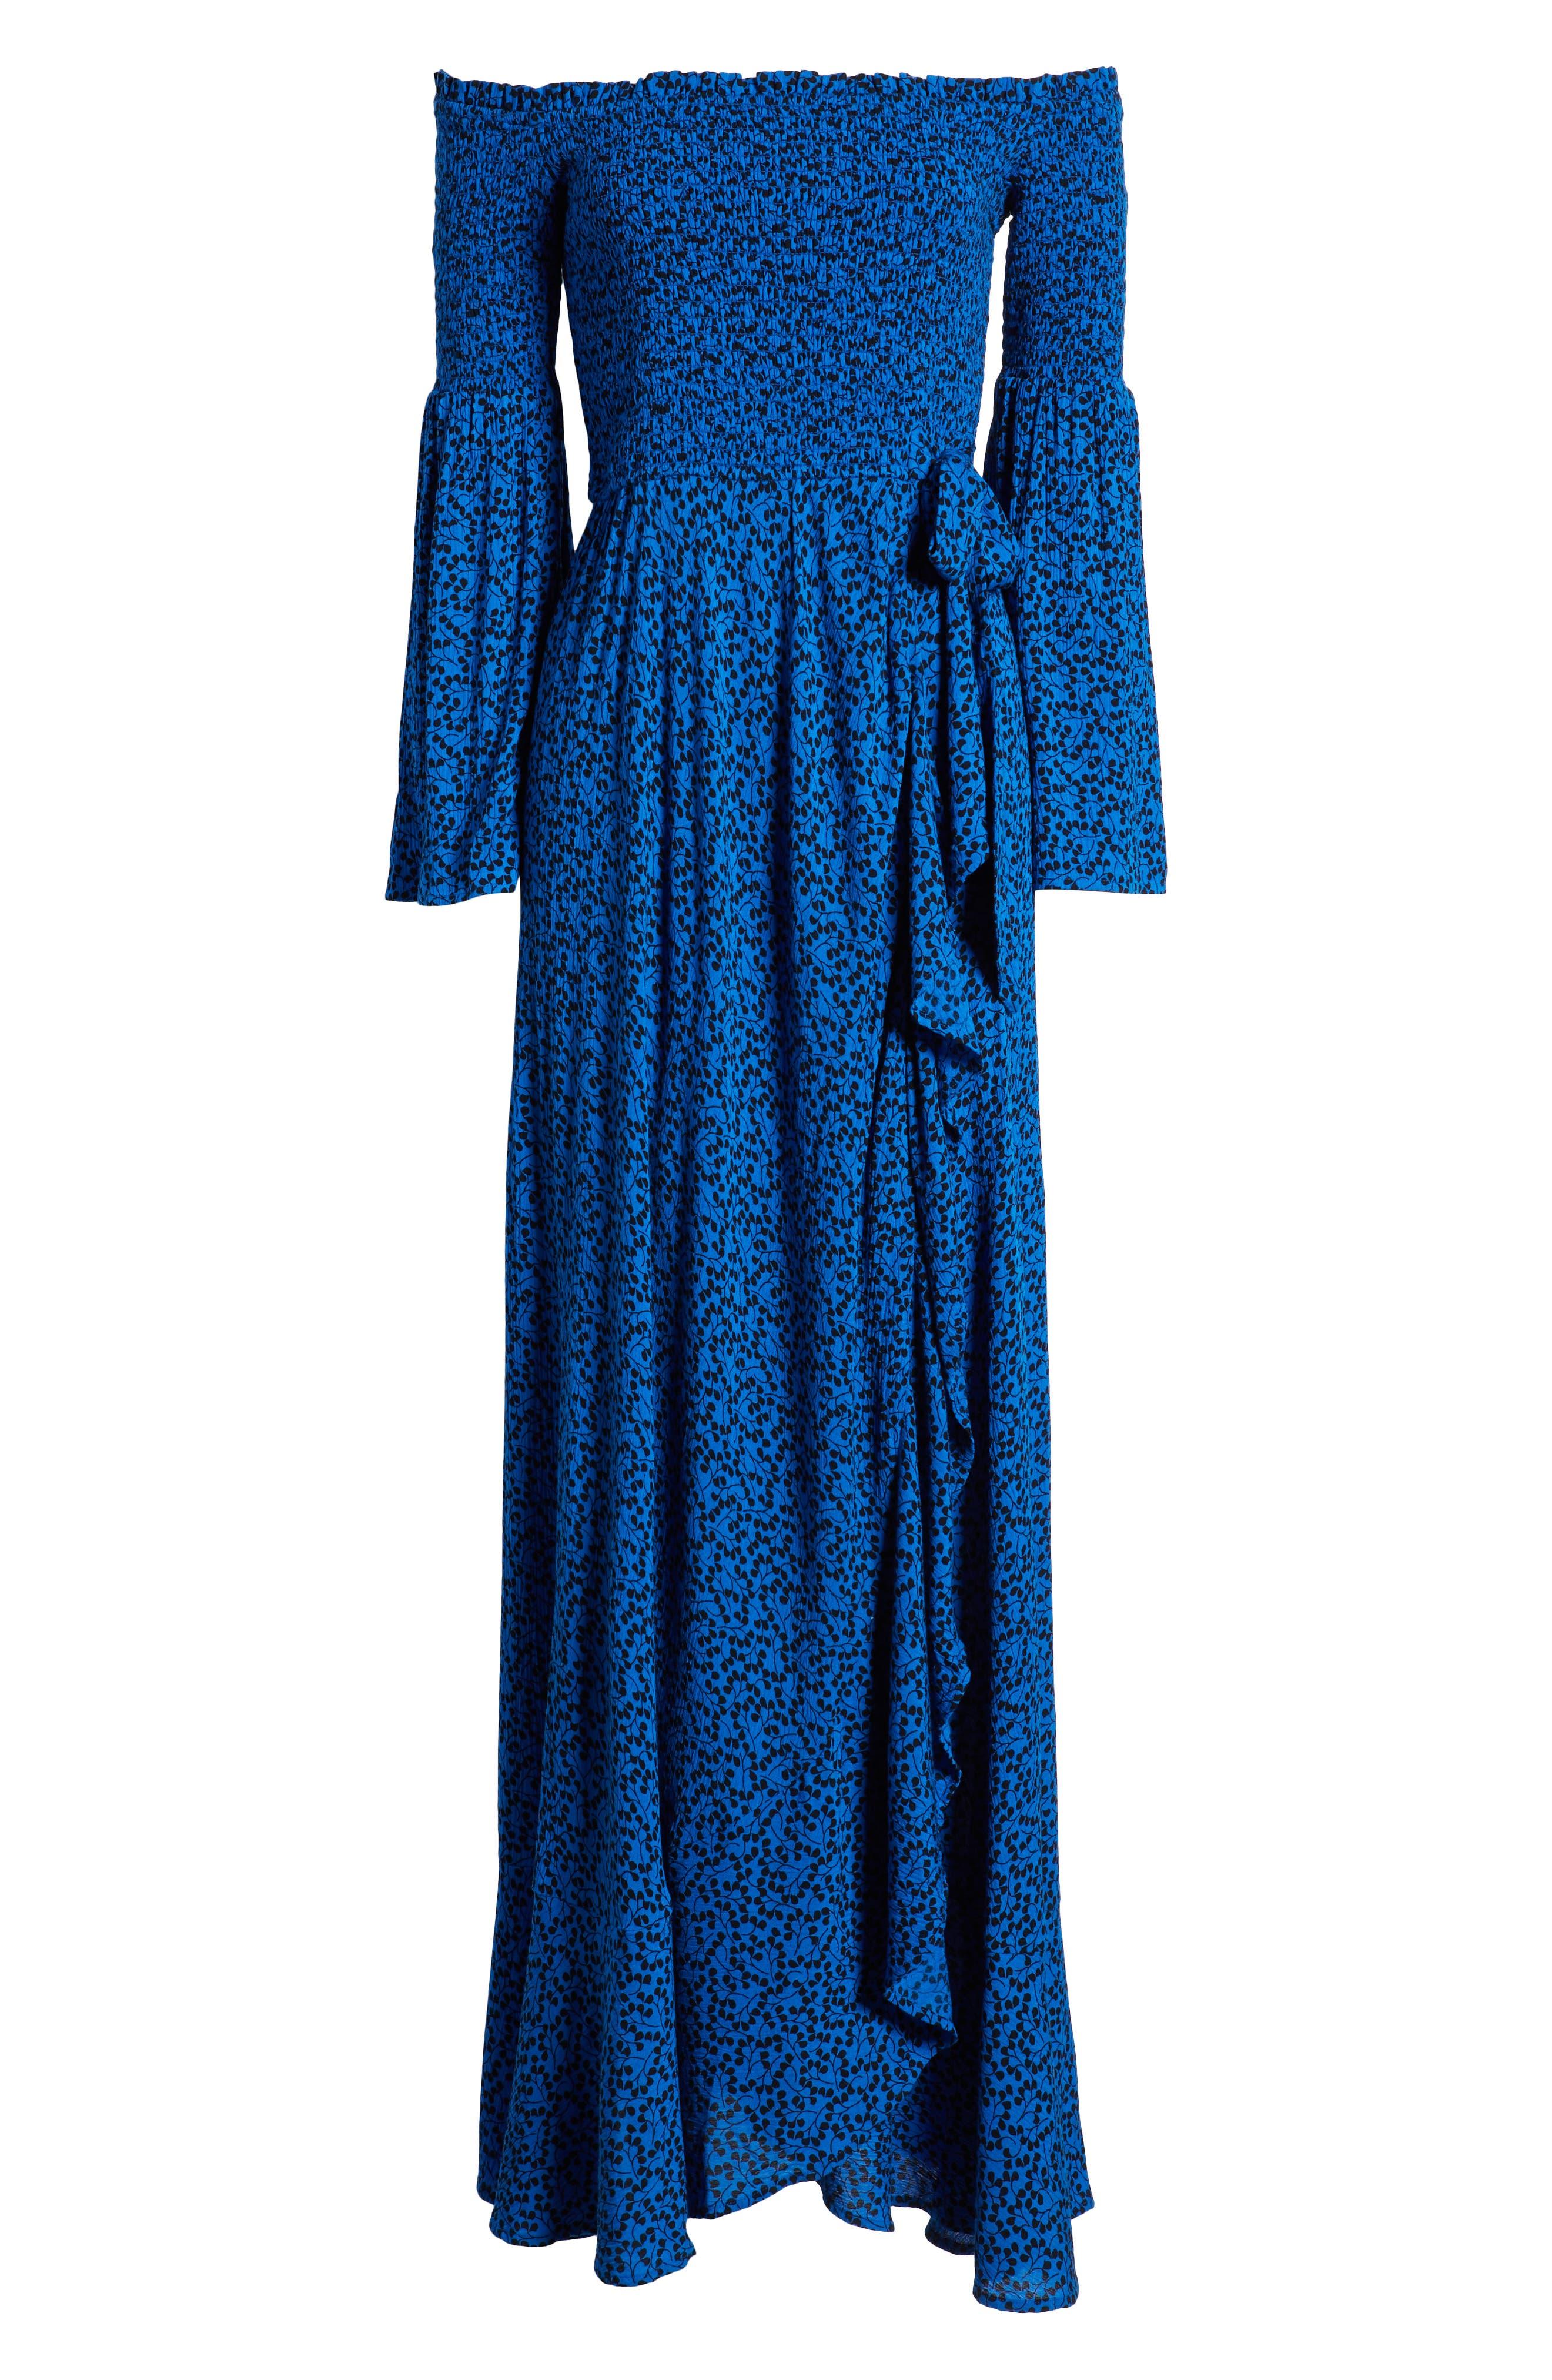 Bali Off The Shoulder Maxi Dress,                             Alternate thumbnail 7, color,                             ROYAL/ BLACK